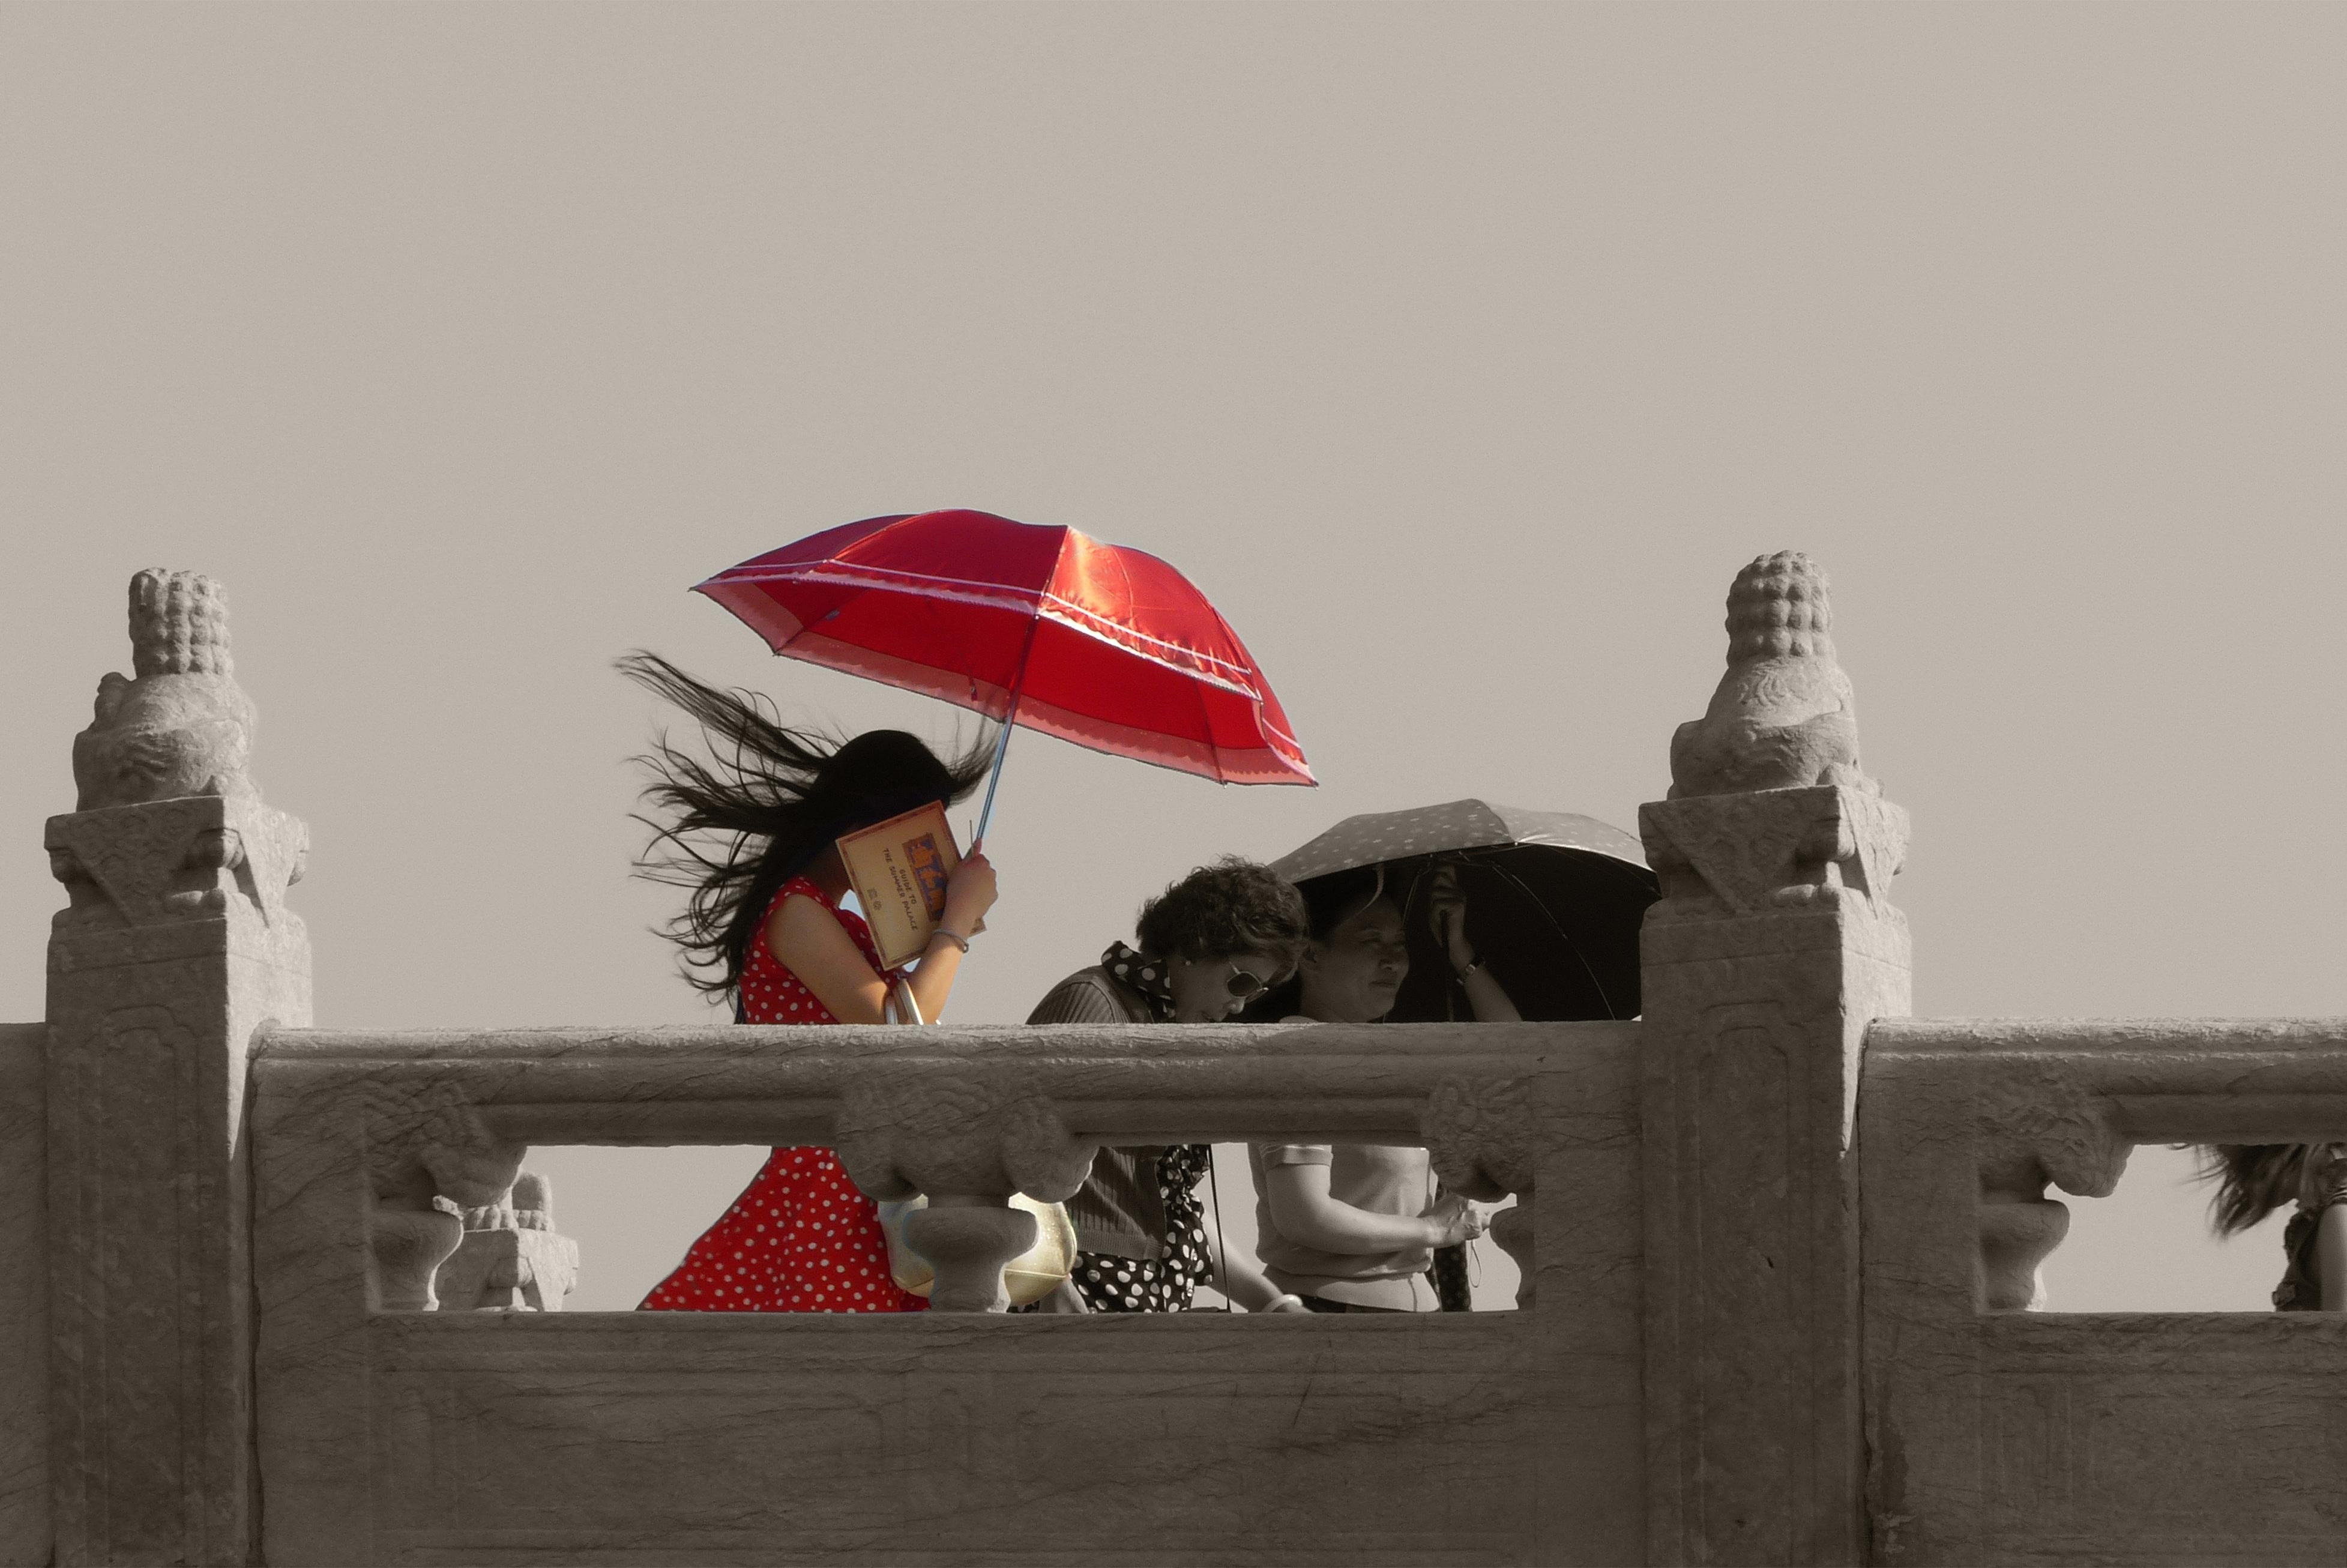 Free Images White Red Umbrella Color Black Monochrome Sunny